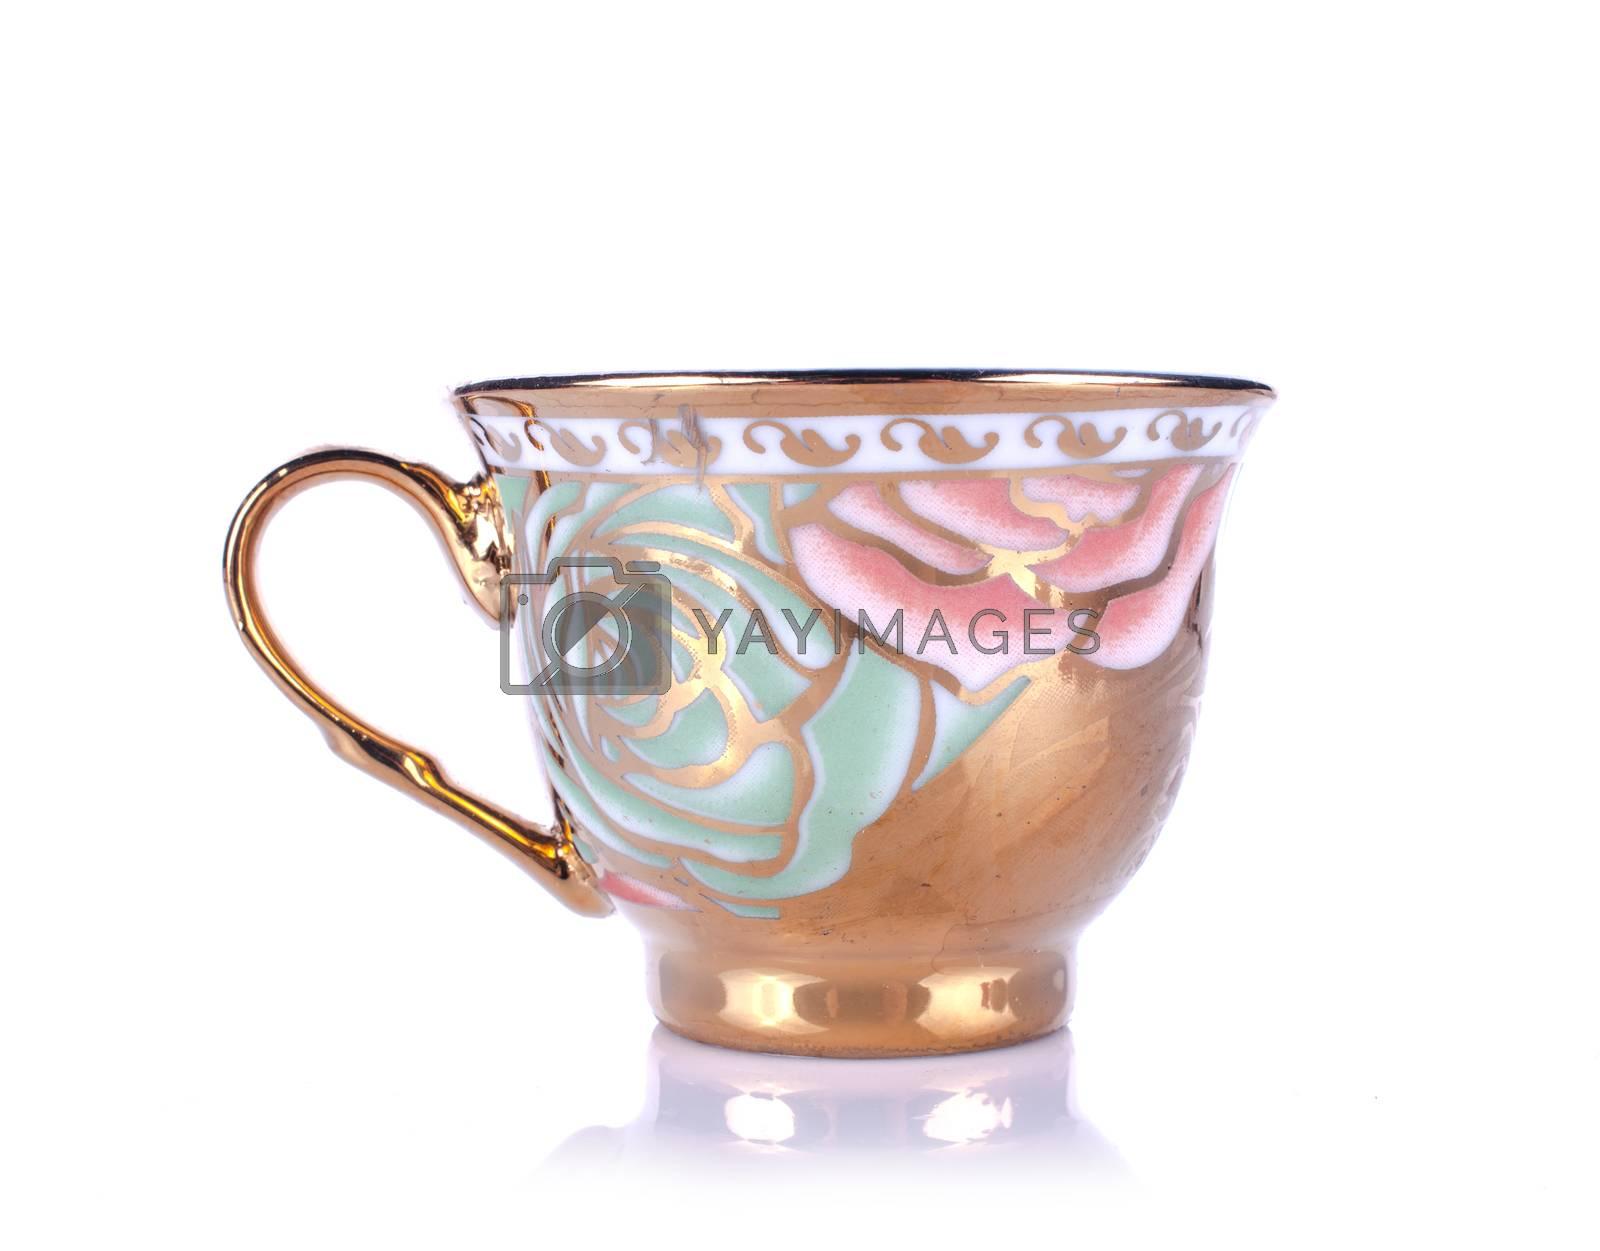 tea sets close up isolated on white background